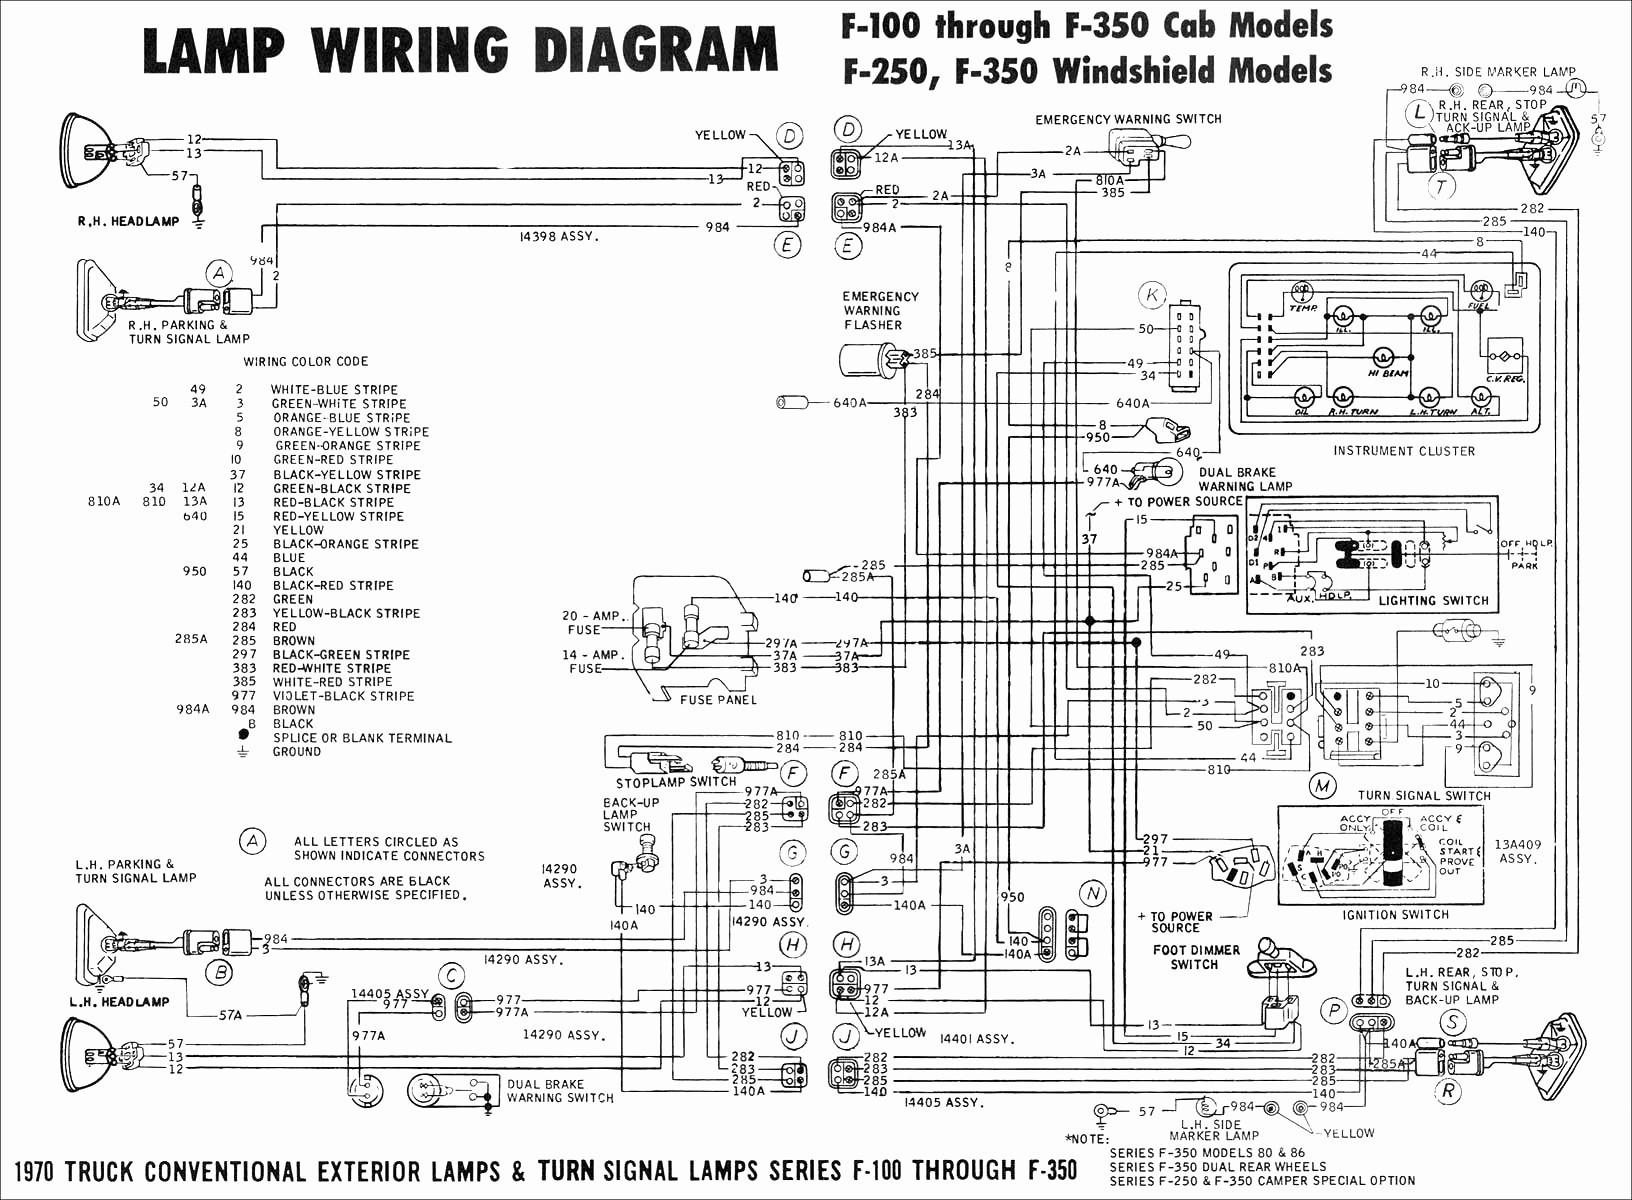 2005 ford Explorer Wiring Diagram 1991 ford Explorer Xlt Fuse Diagram Wiring Diagram Used Of 2005 ford Explorer Wiring Diagram